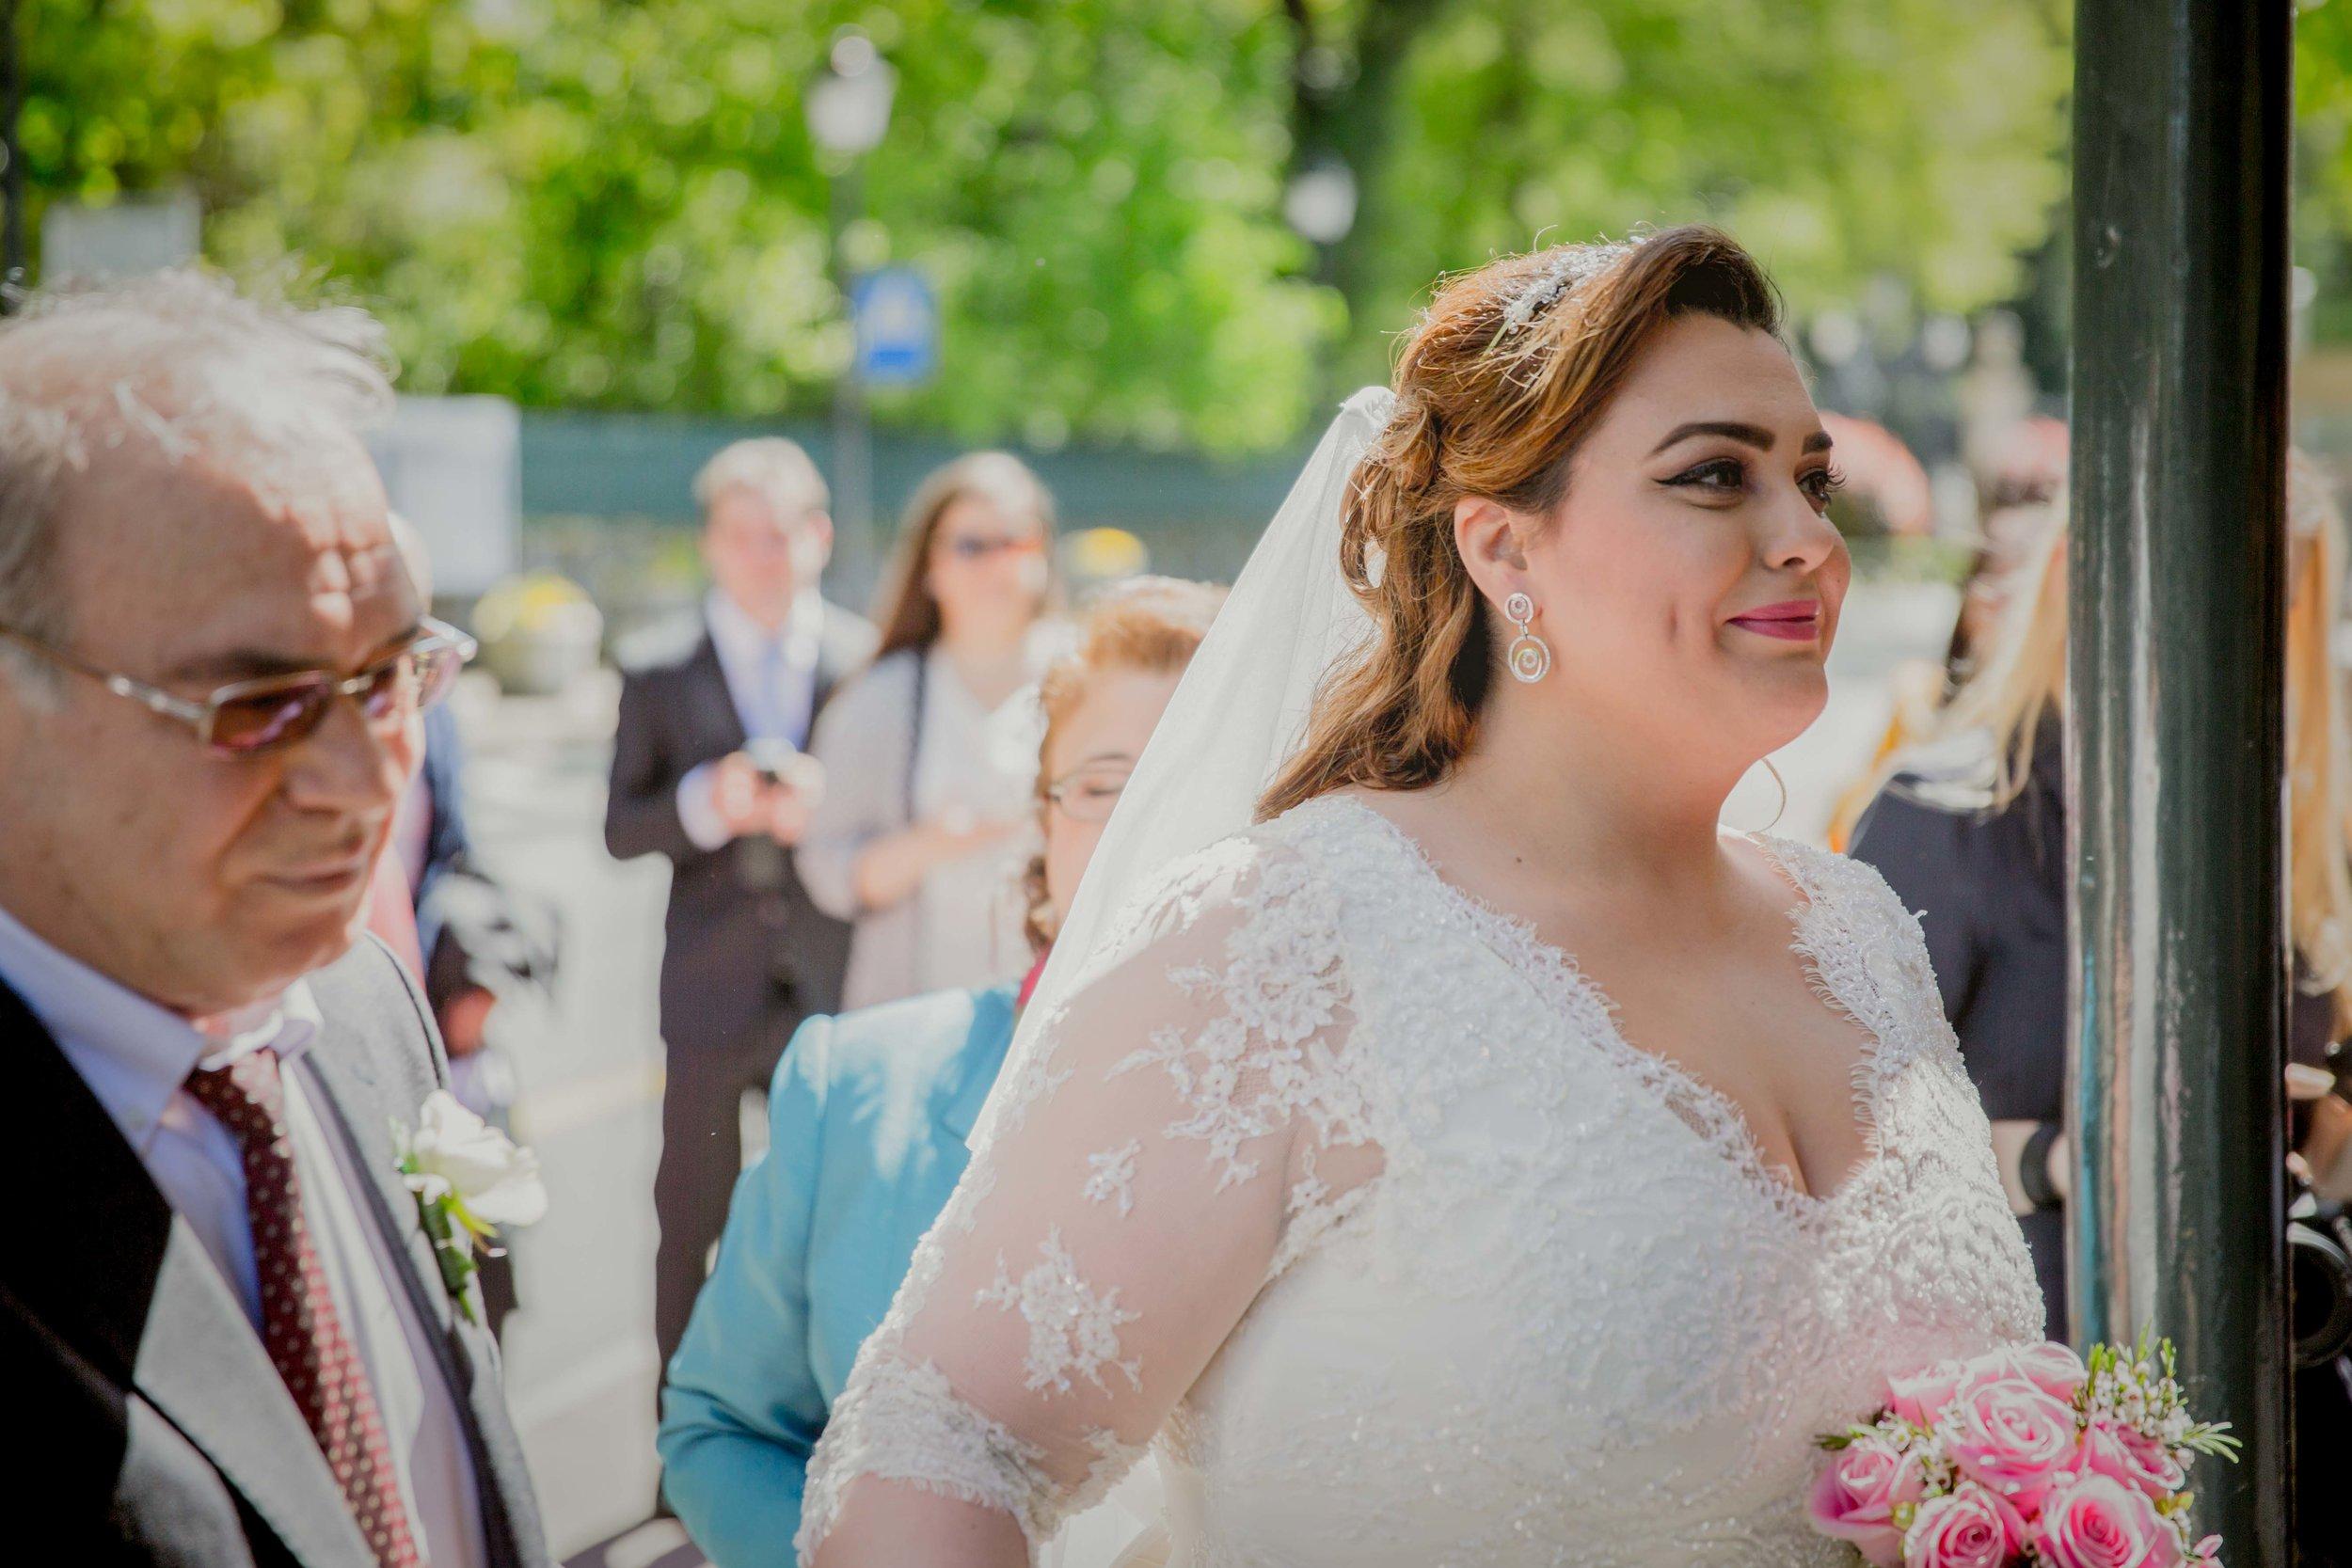 parc-des-eaux-vives-destination-wedding-photographer-geneva-switzerland-natalia-smith-photography-11.jpg